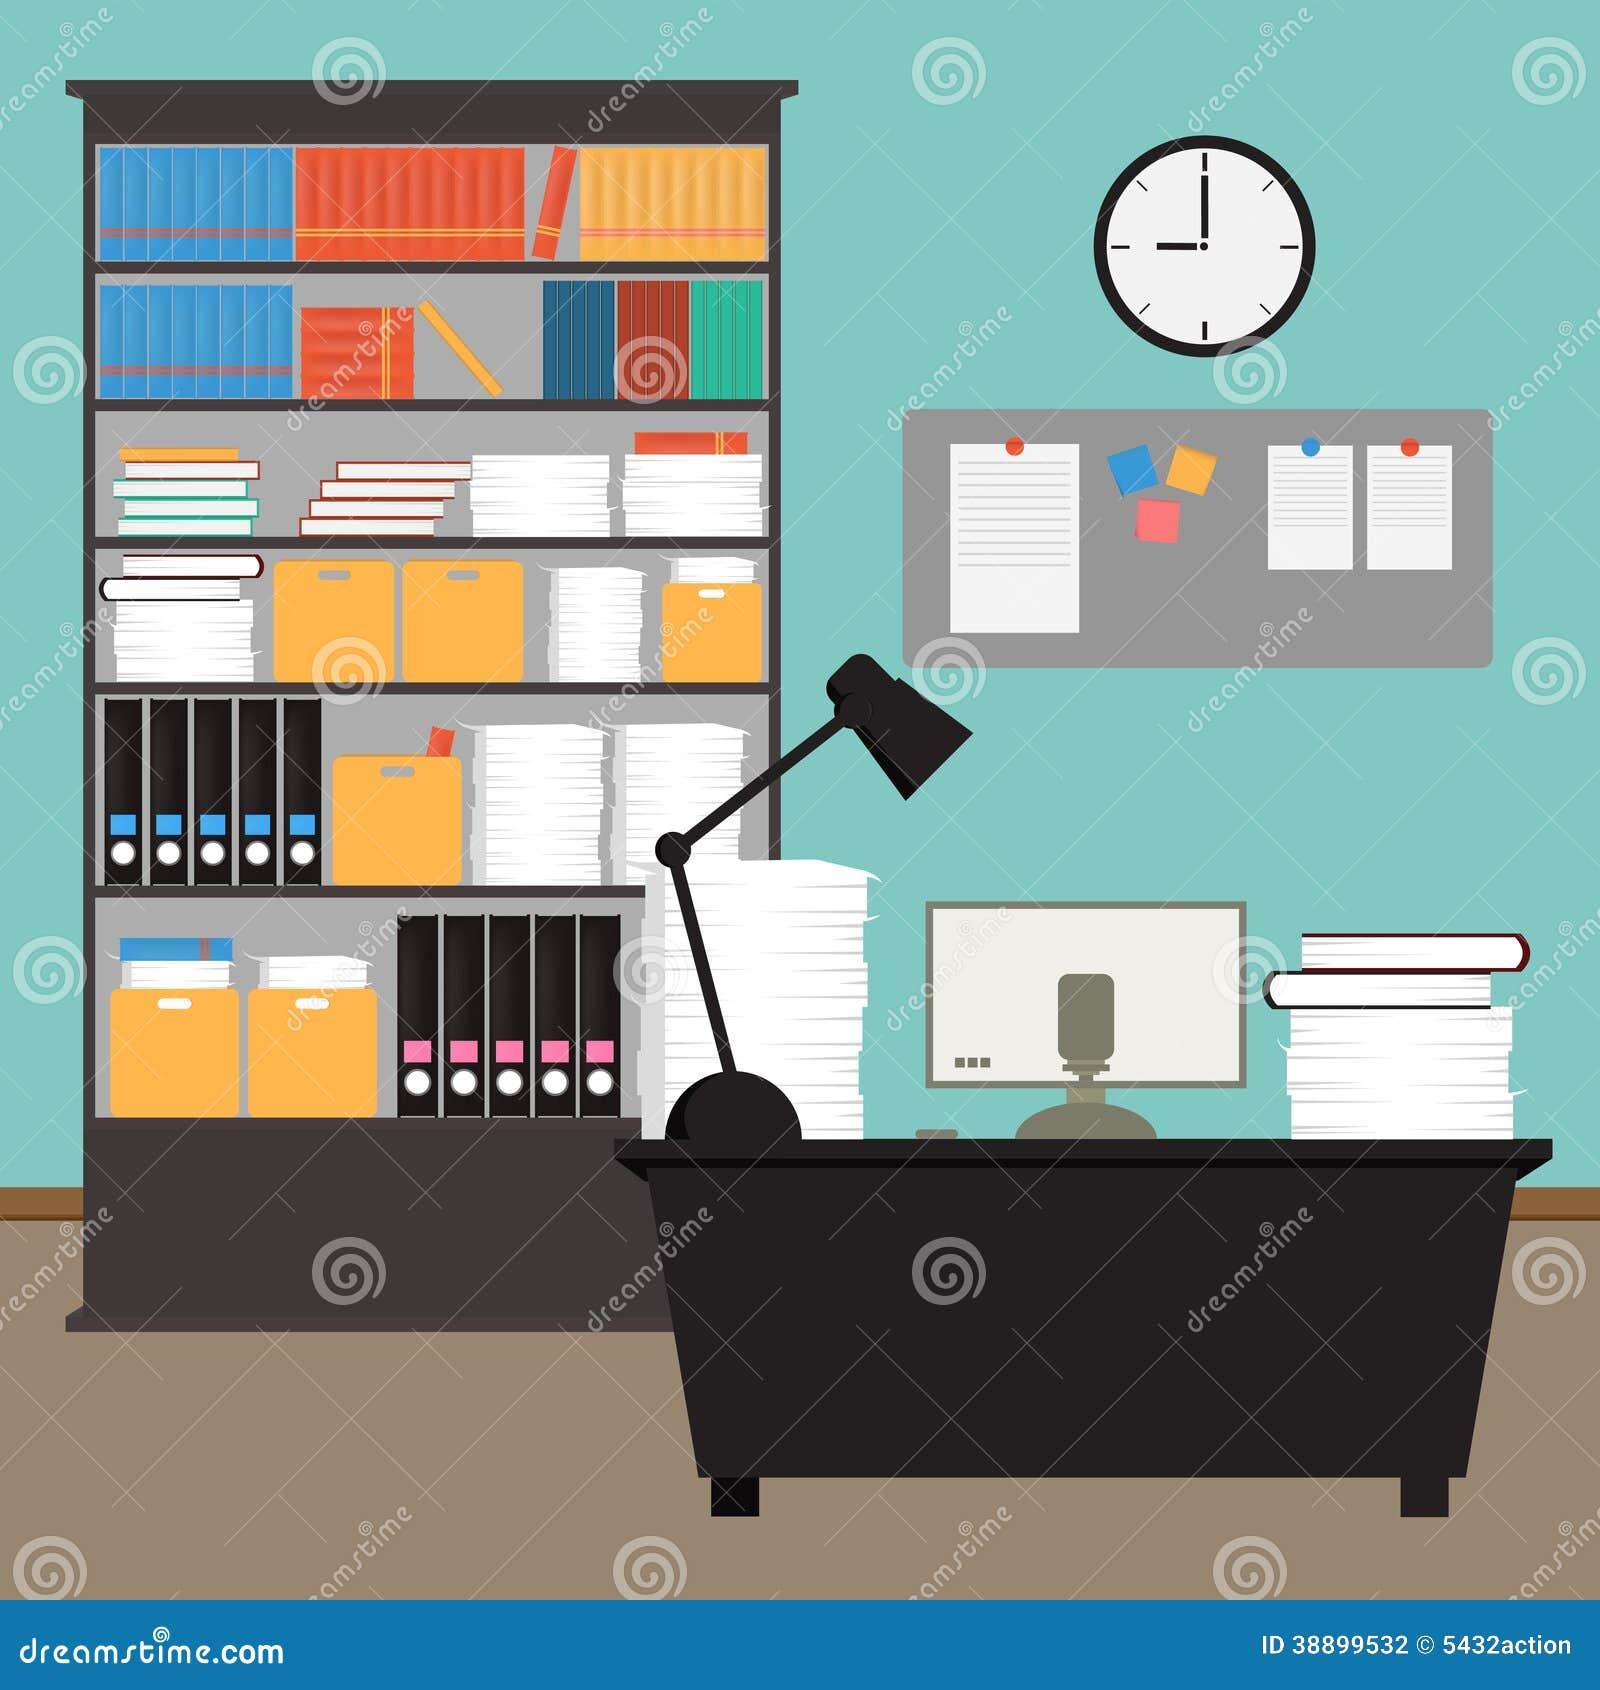 Vector Office Room In EPS 10 Stock Vector Image 38899532